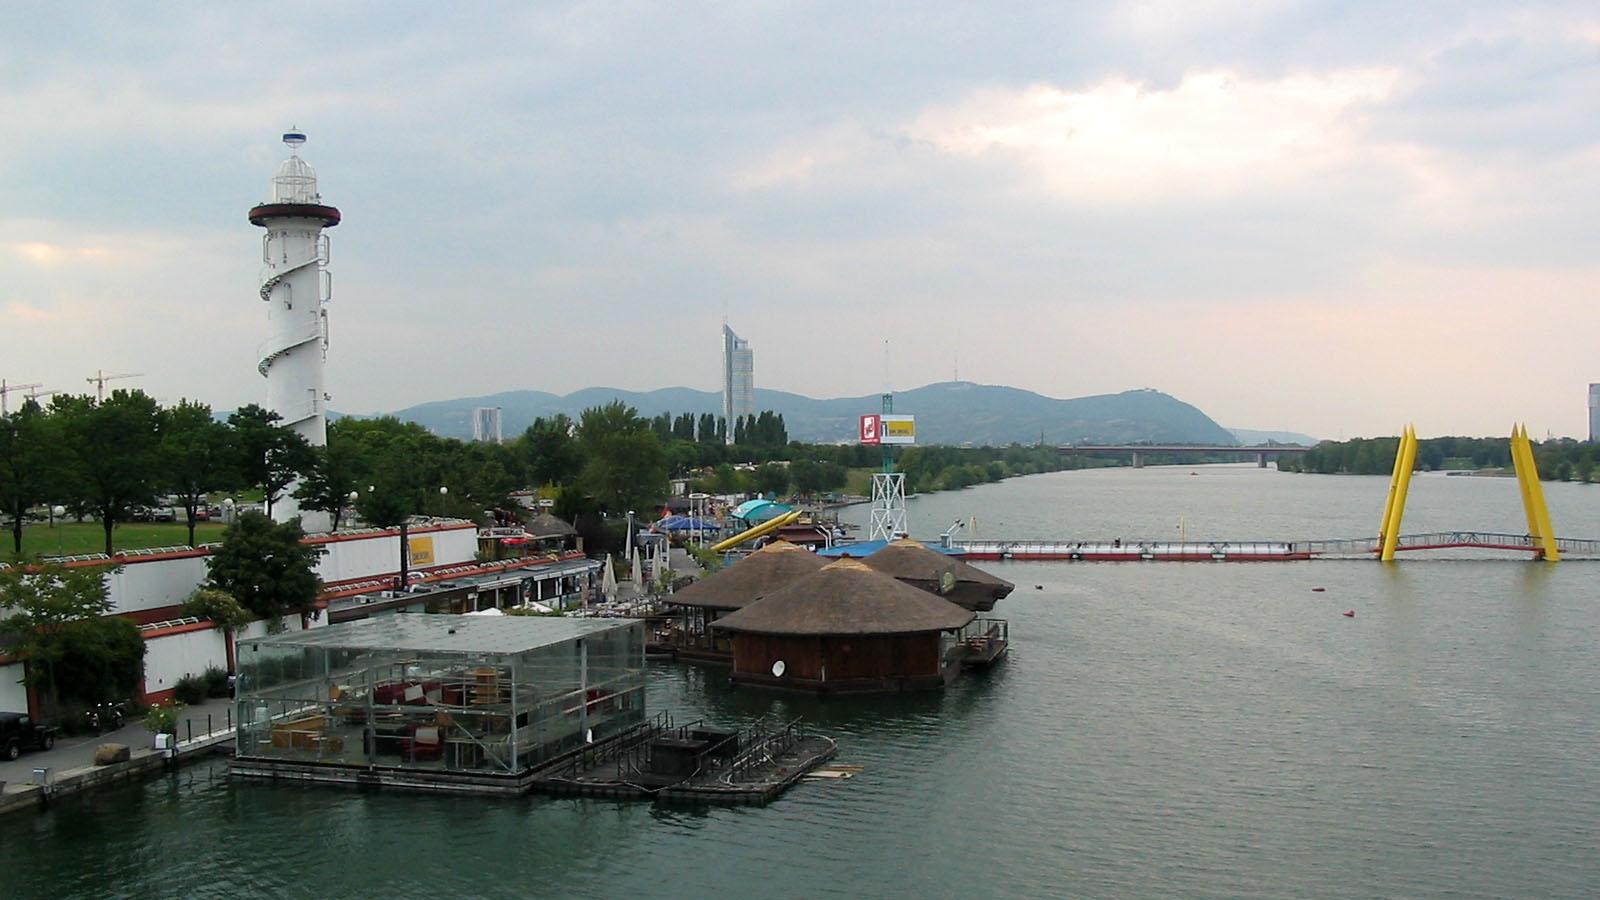 File Donauinsel Sunken City 2007 Jpg Wikimedia Commons